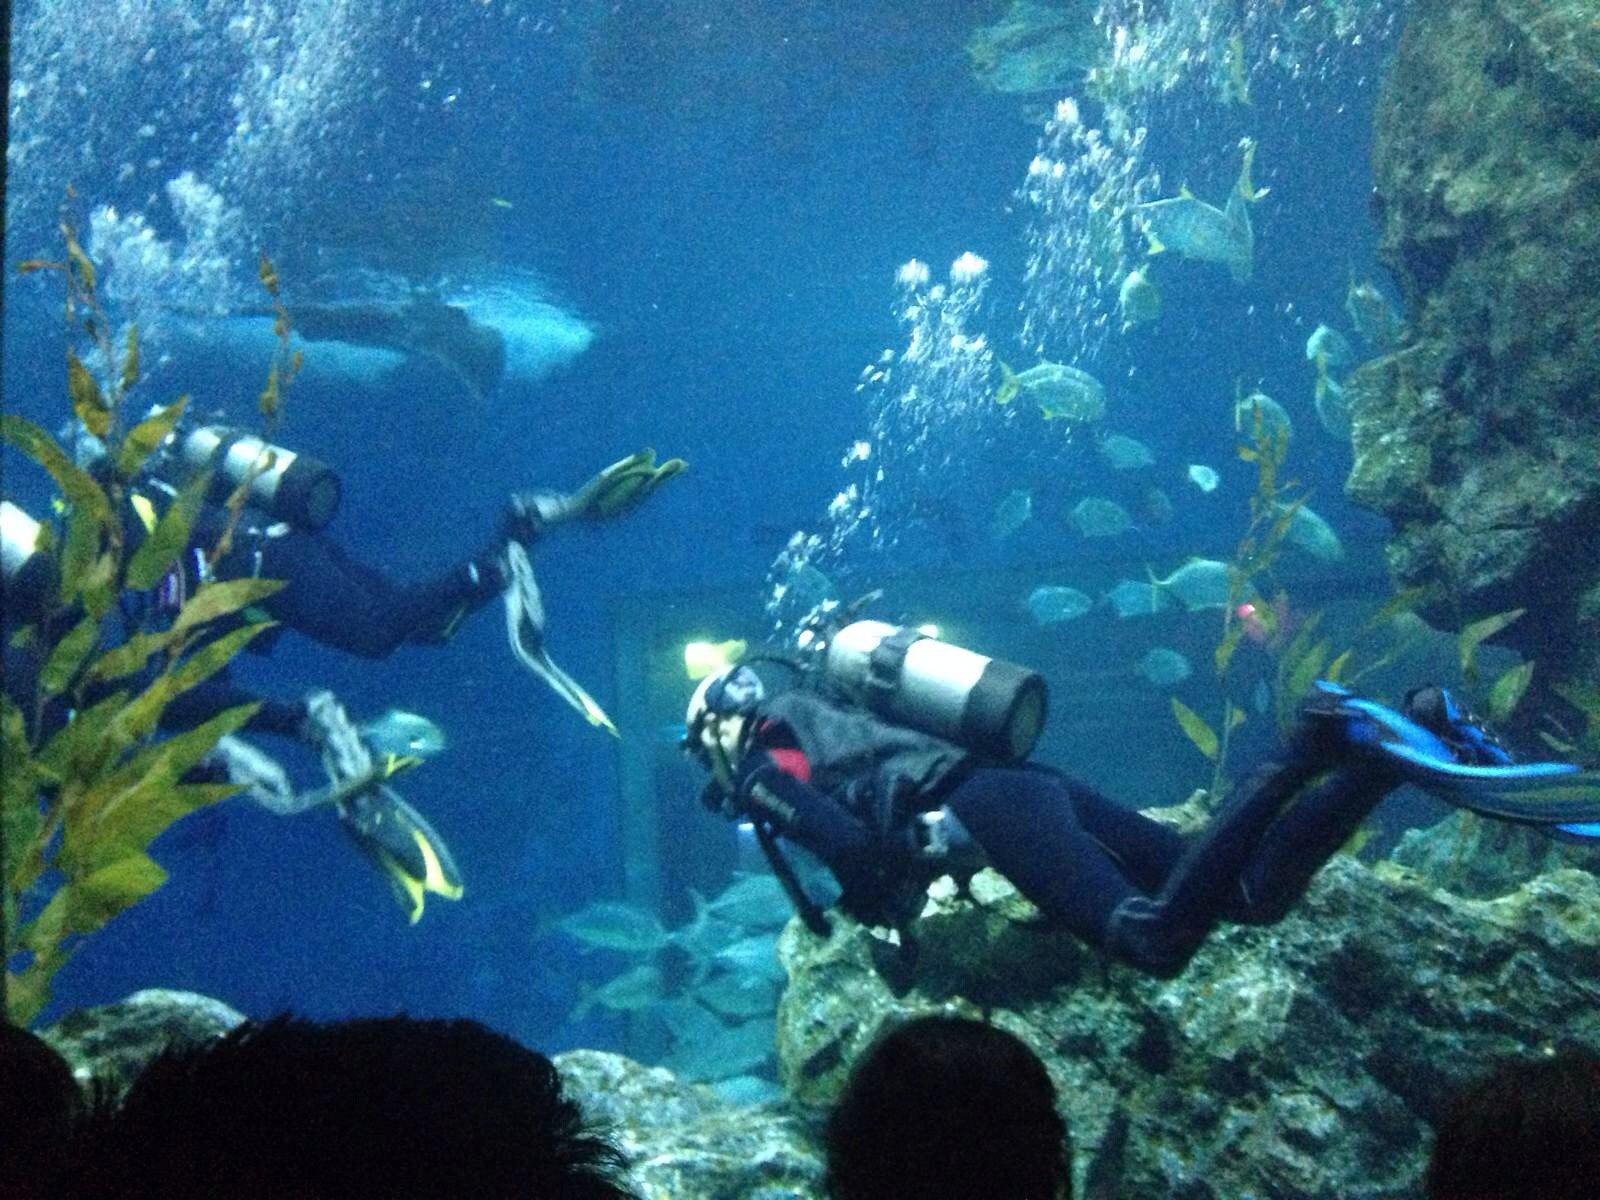 曼谷暹羅海洋世界  Sea Life Bangkok Ocean World   -1